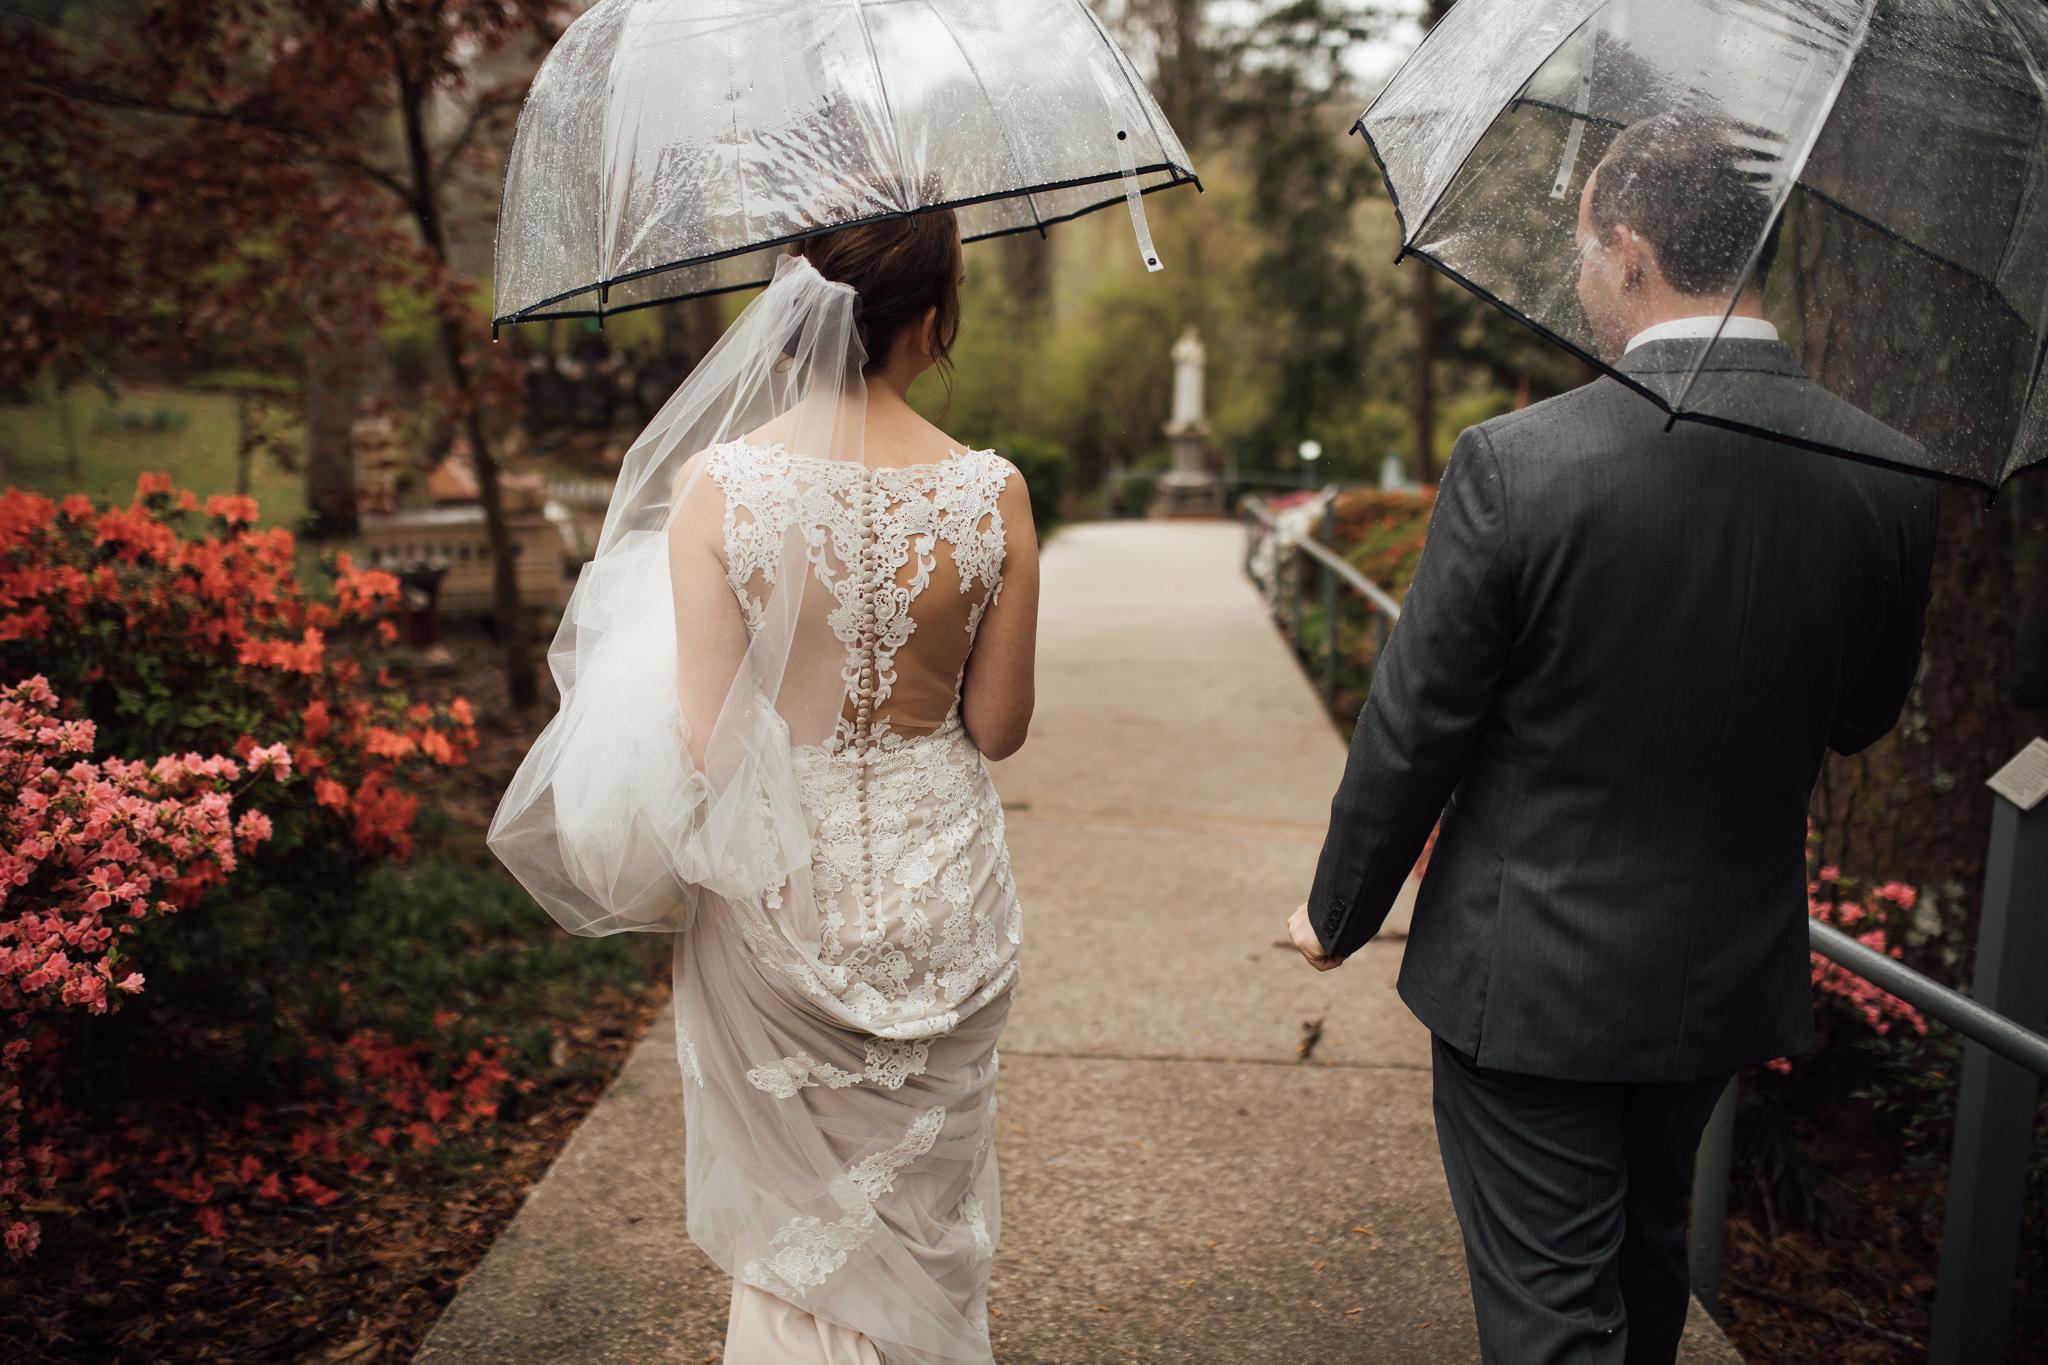 birmingham-alabama-wedding-photographer-laura-terry-the-warmth-around-you (56 of 110).jpg